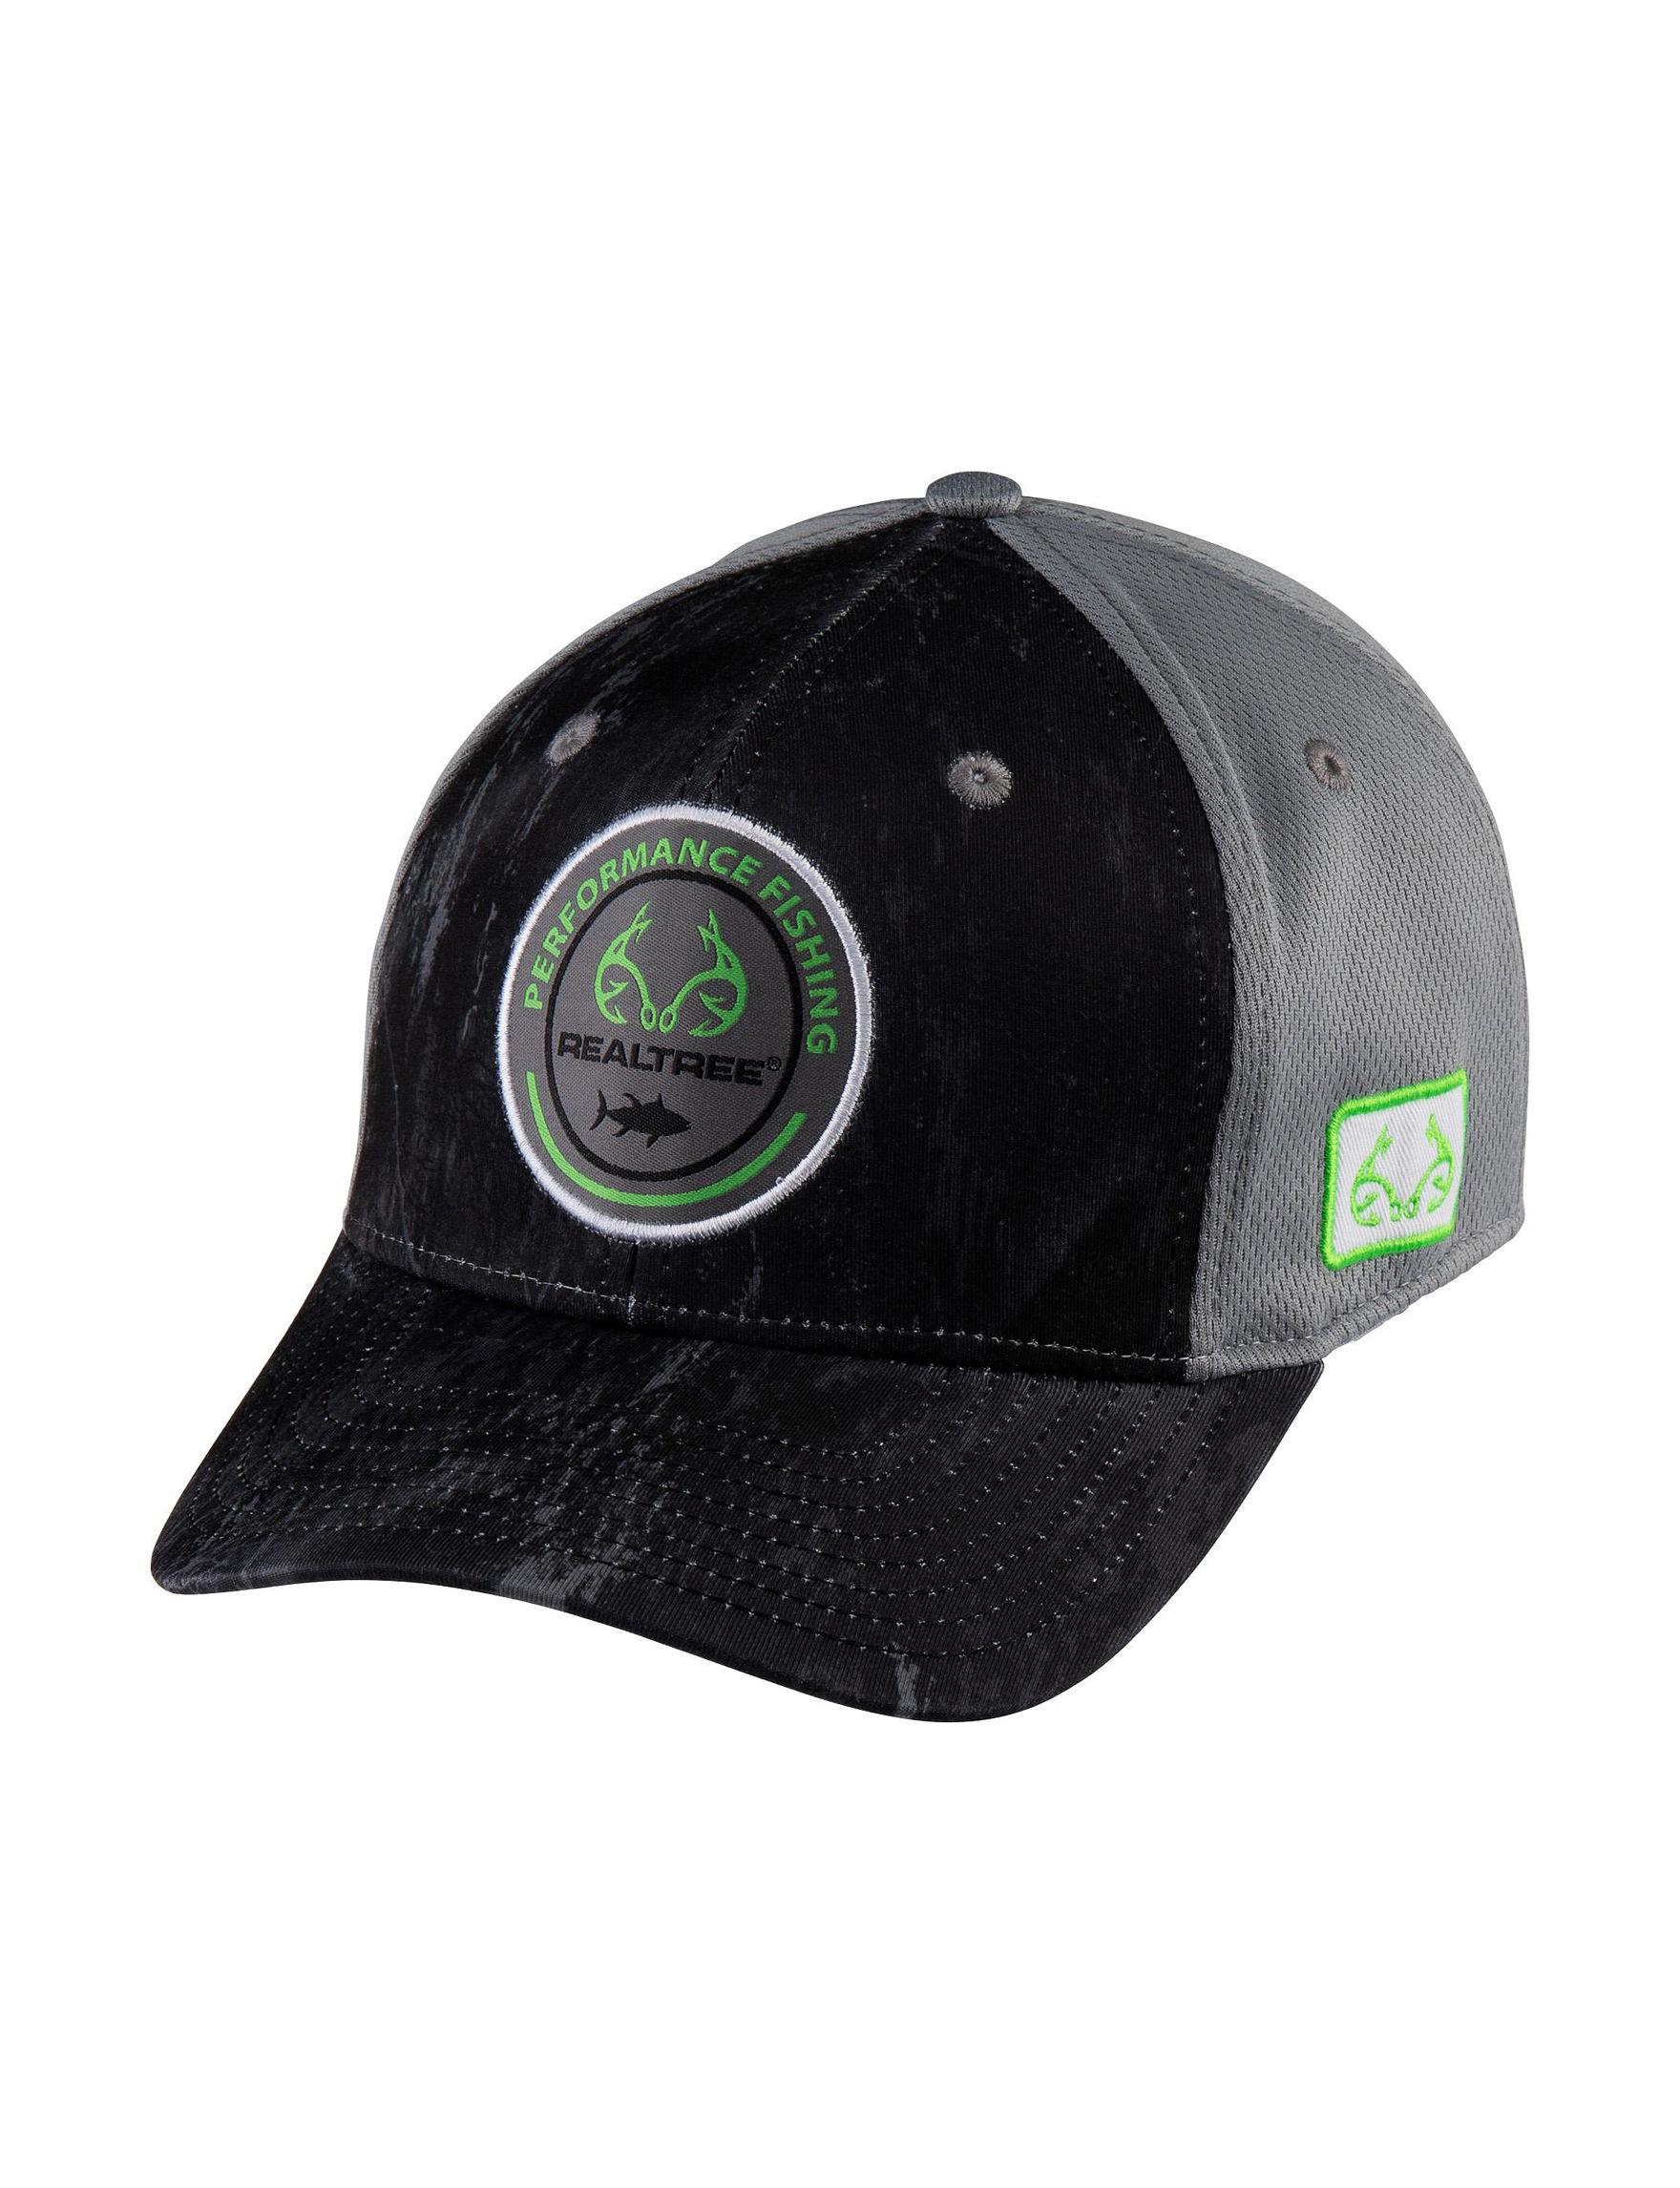 Realtree Ink Hats & Headwear Baseball Caps